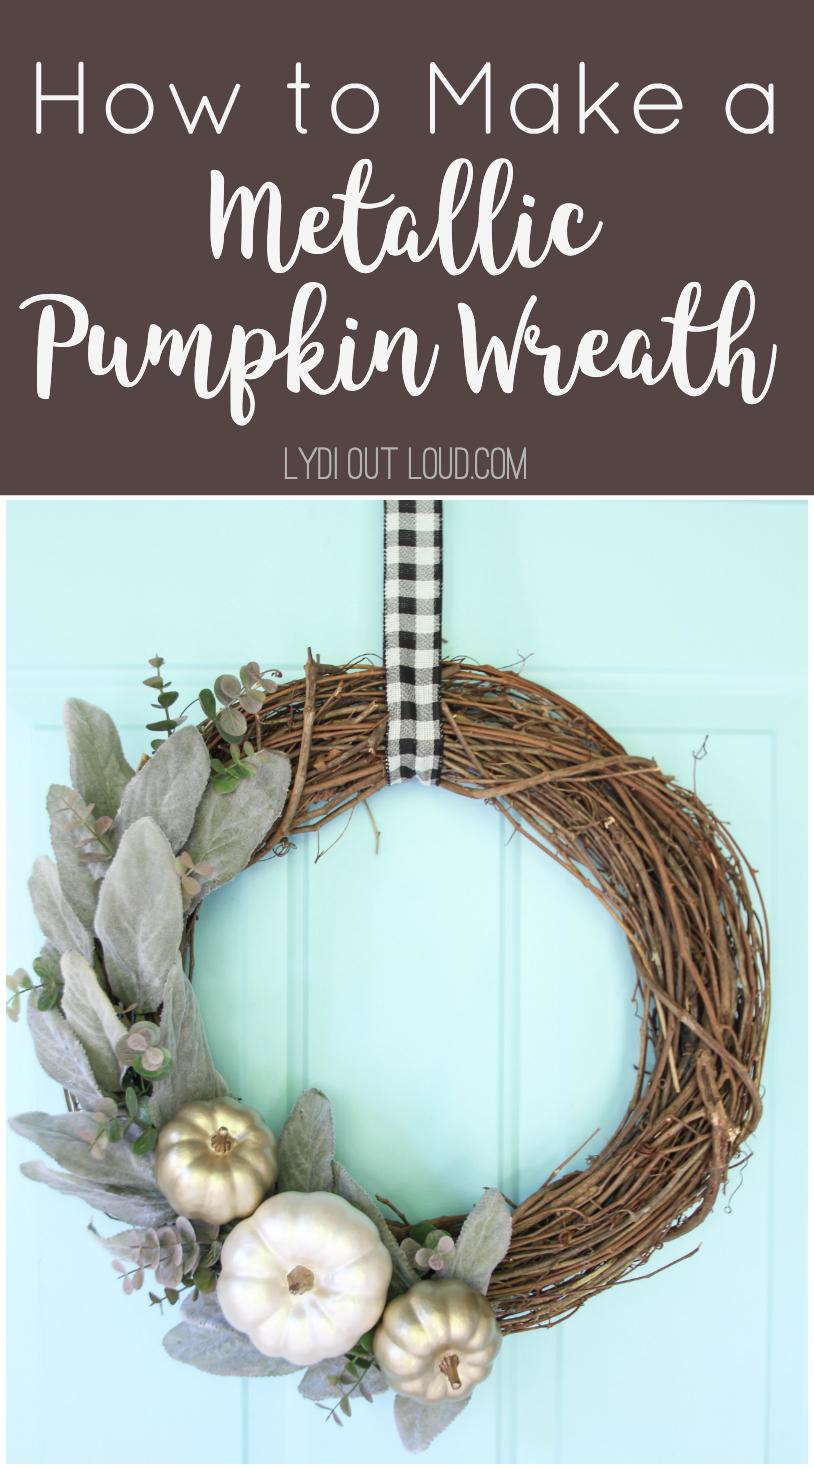 How to Make a DIY Metallic Pumpkin Wreath - perfect for fall! via @lydioutloud